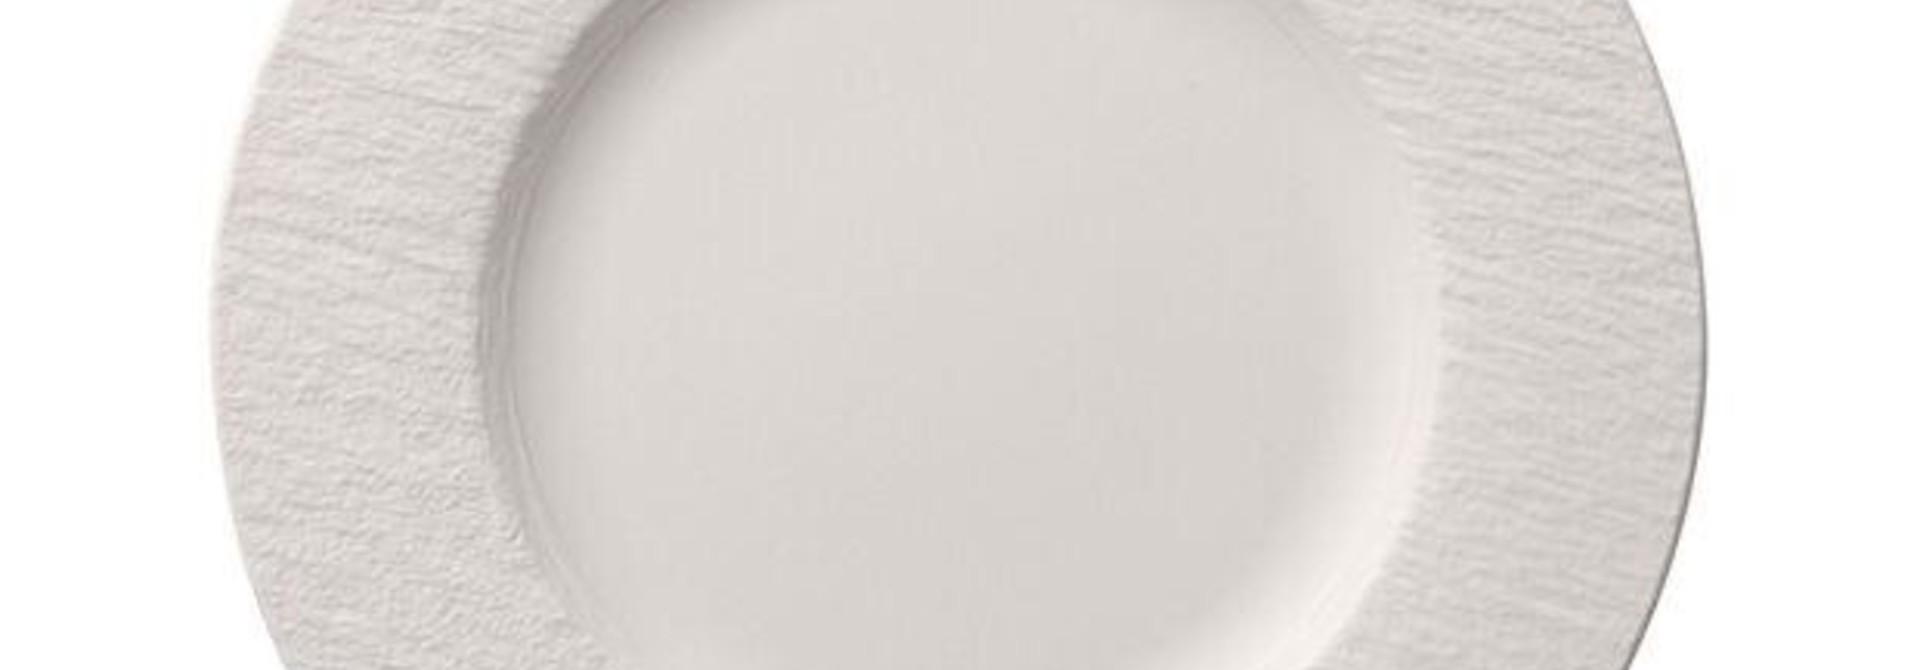 VILLEROY & BOCH - Manufacture Rock White Dessert Plate 27cm